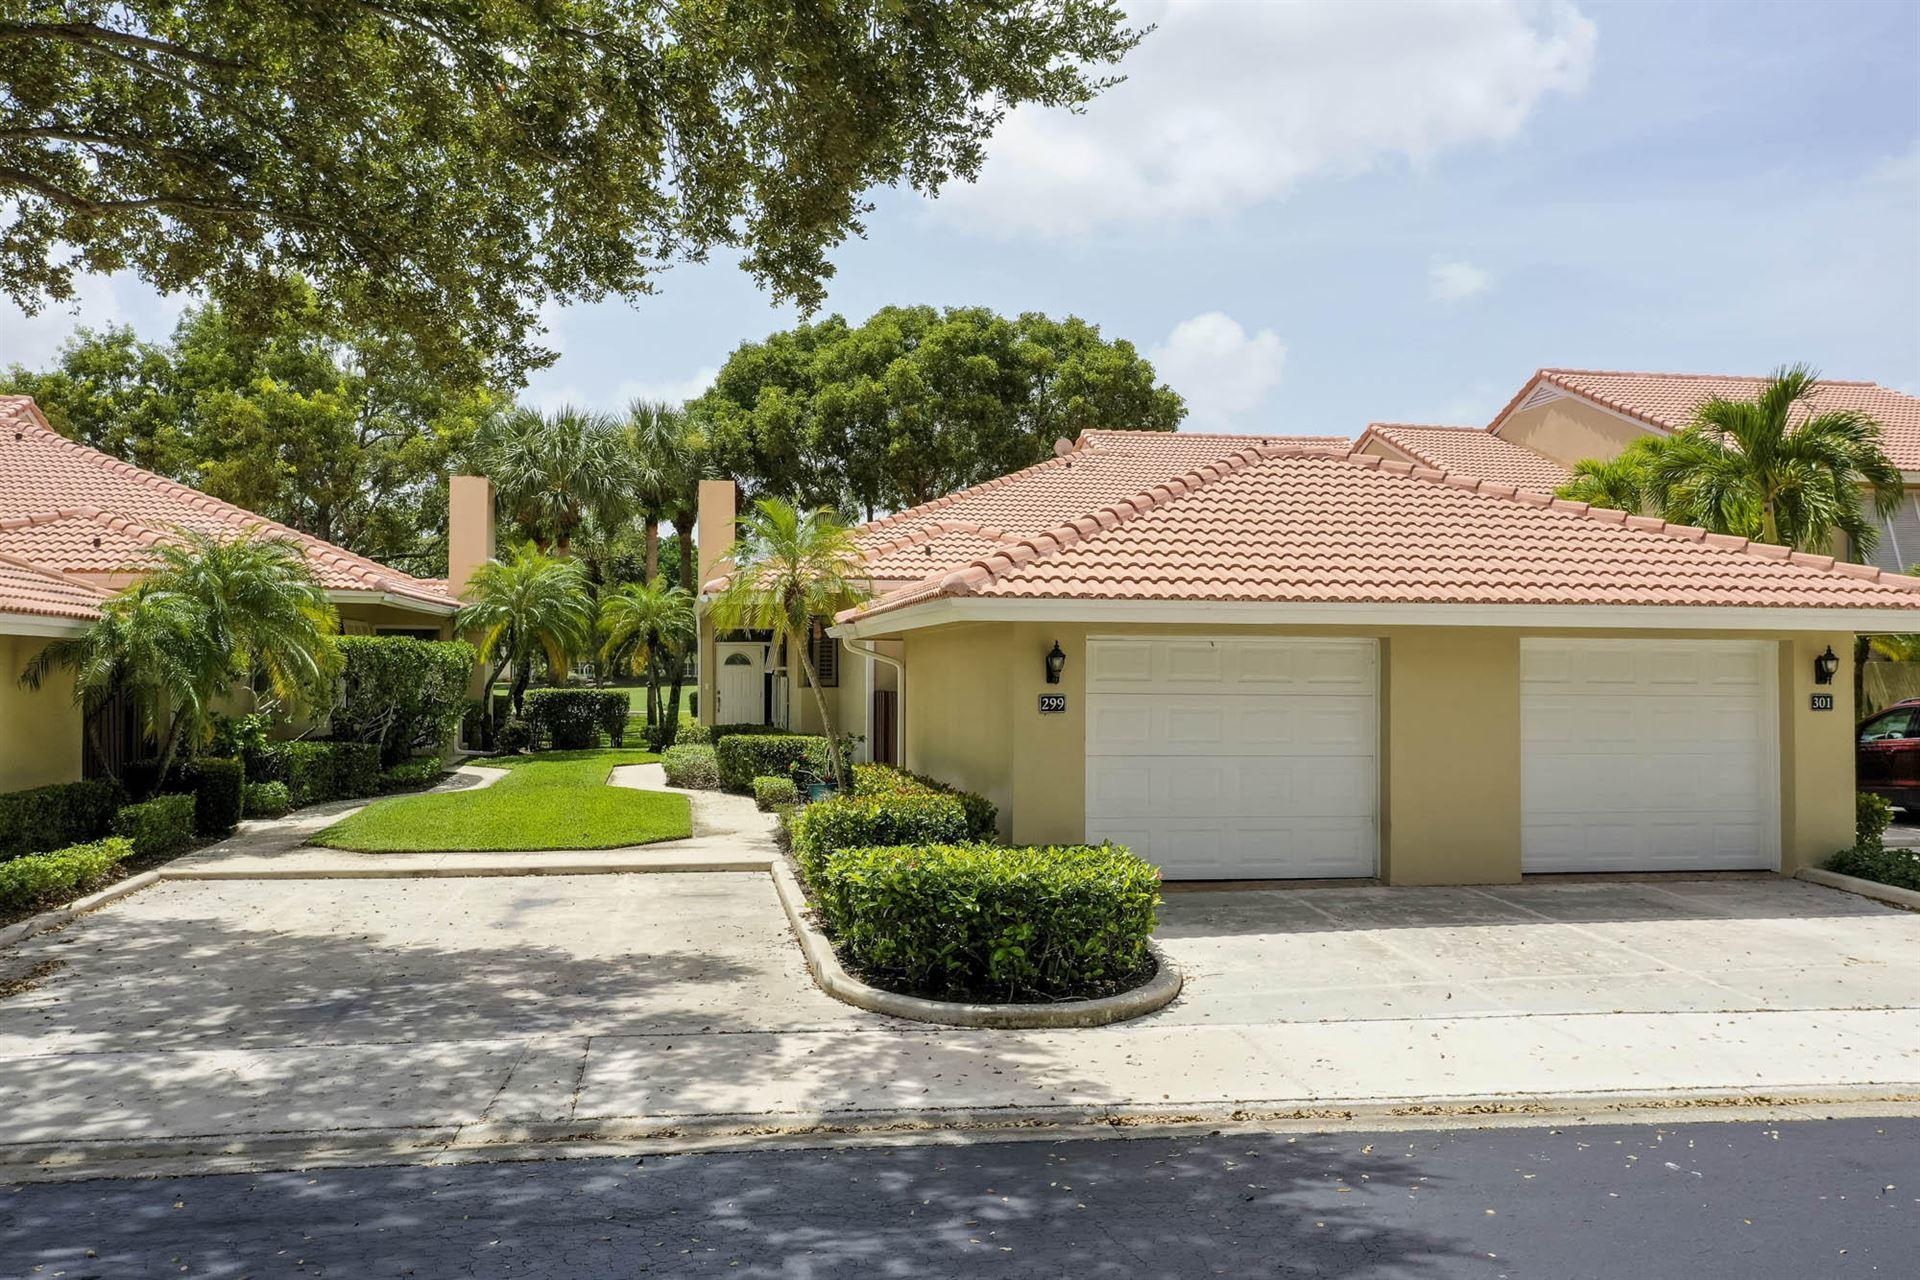 Photo of 299 Old Meadow Way, Palm Beach Gardens, FL 33418 (MLS # RX-10653317)